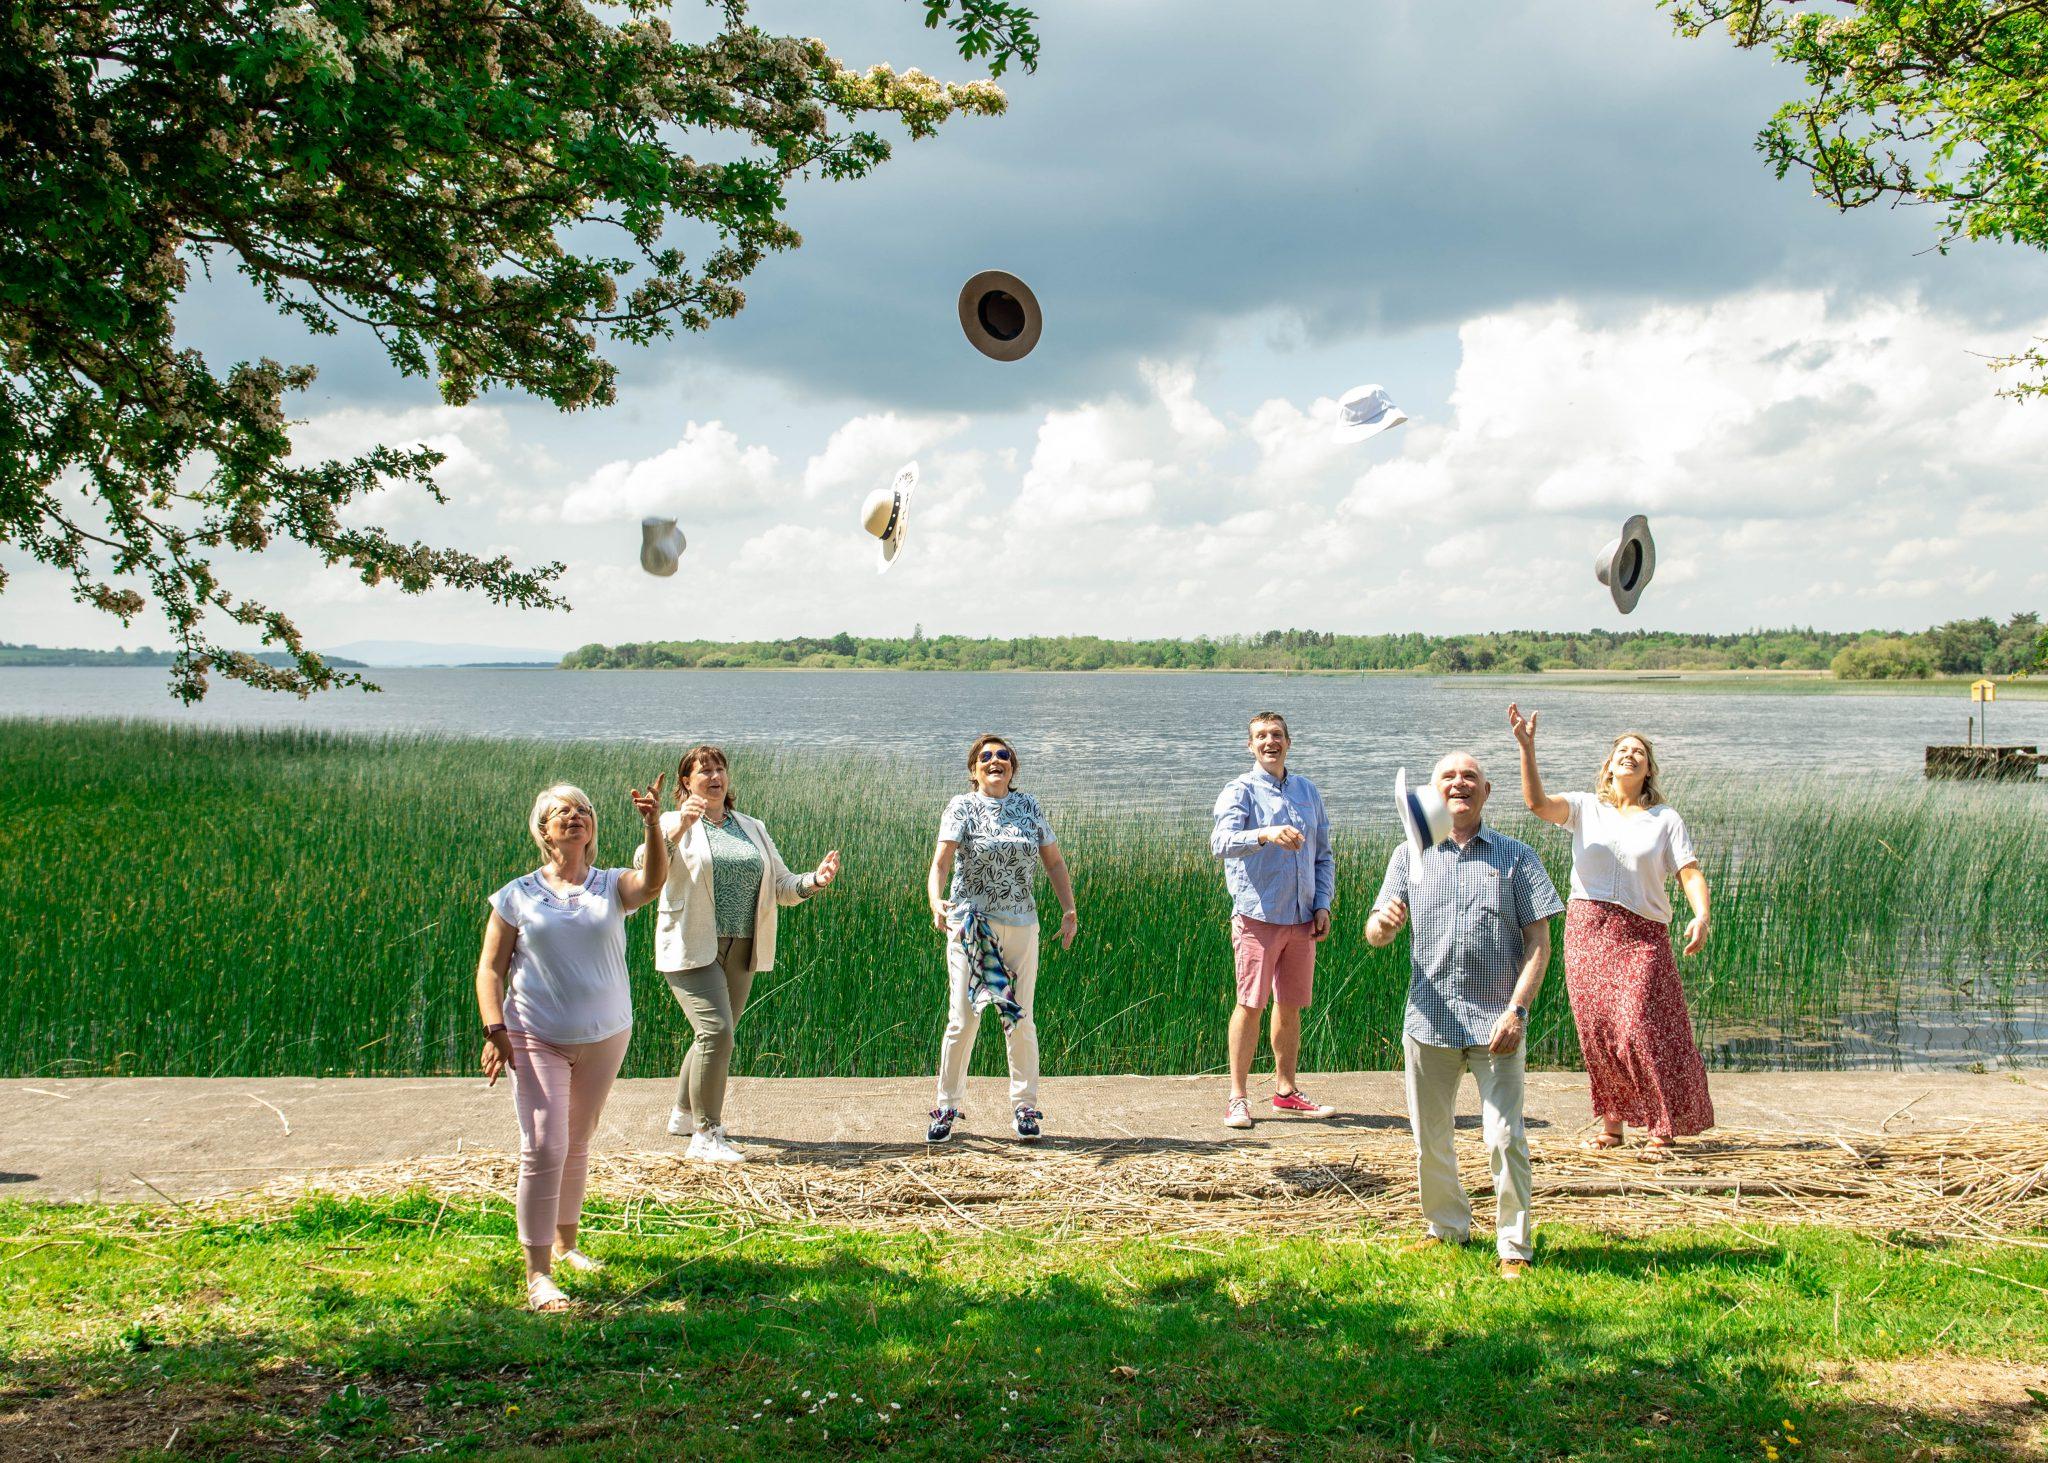 Portumna - Wild Geese Project - Finalists: Digital Changemaker 1